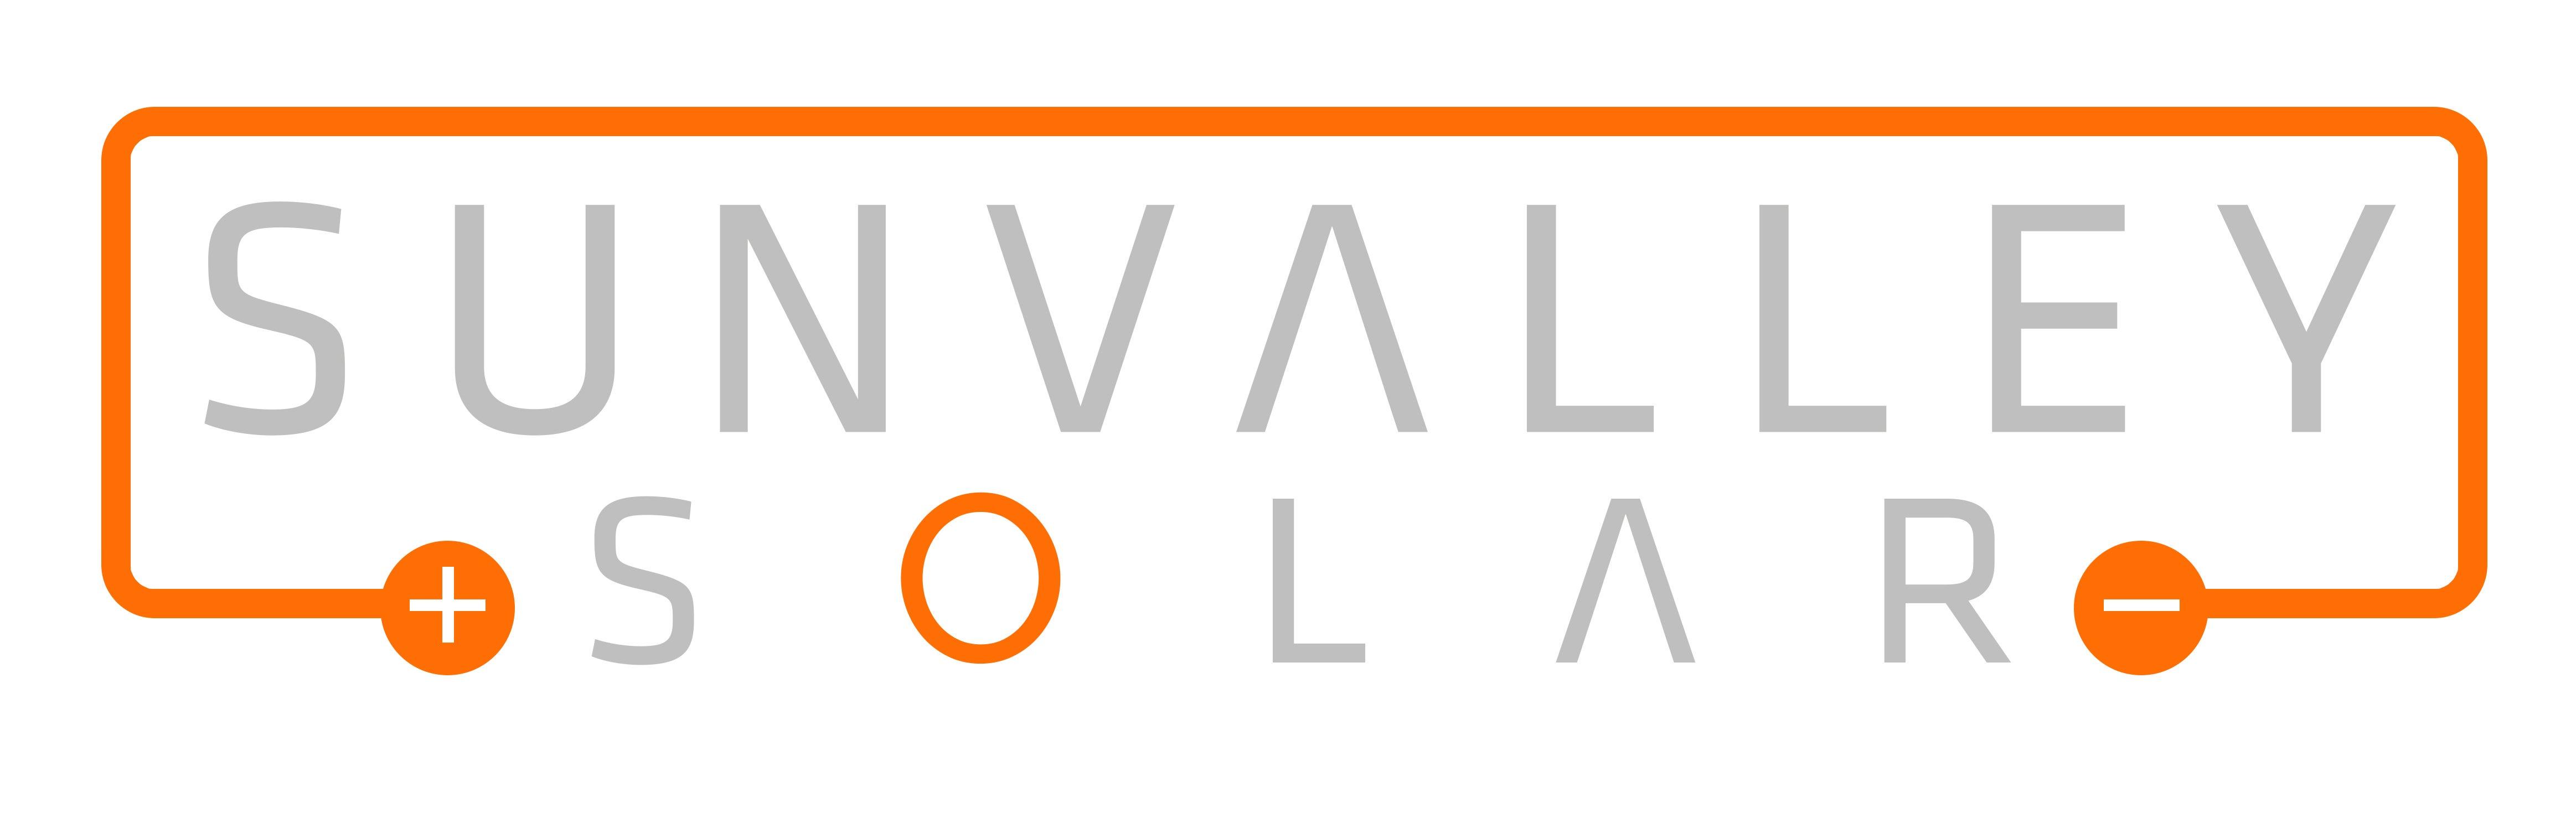 Vivint solar reviews california - 5 00 Based On 1 Reviews